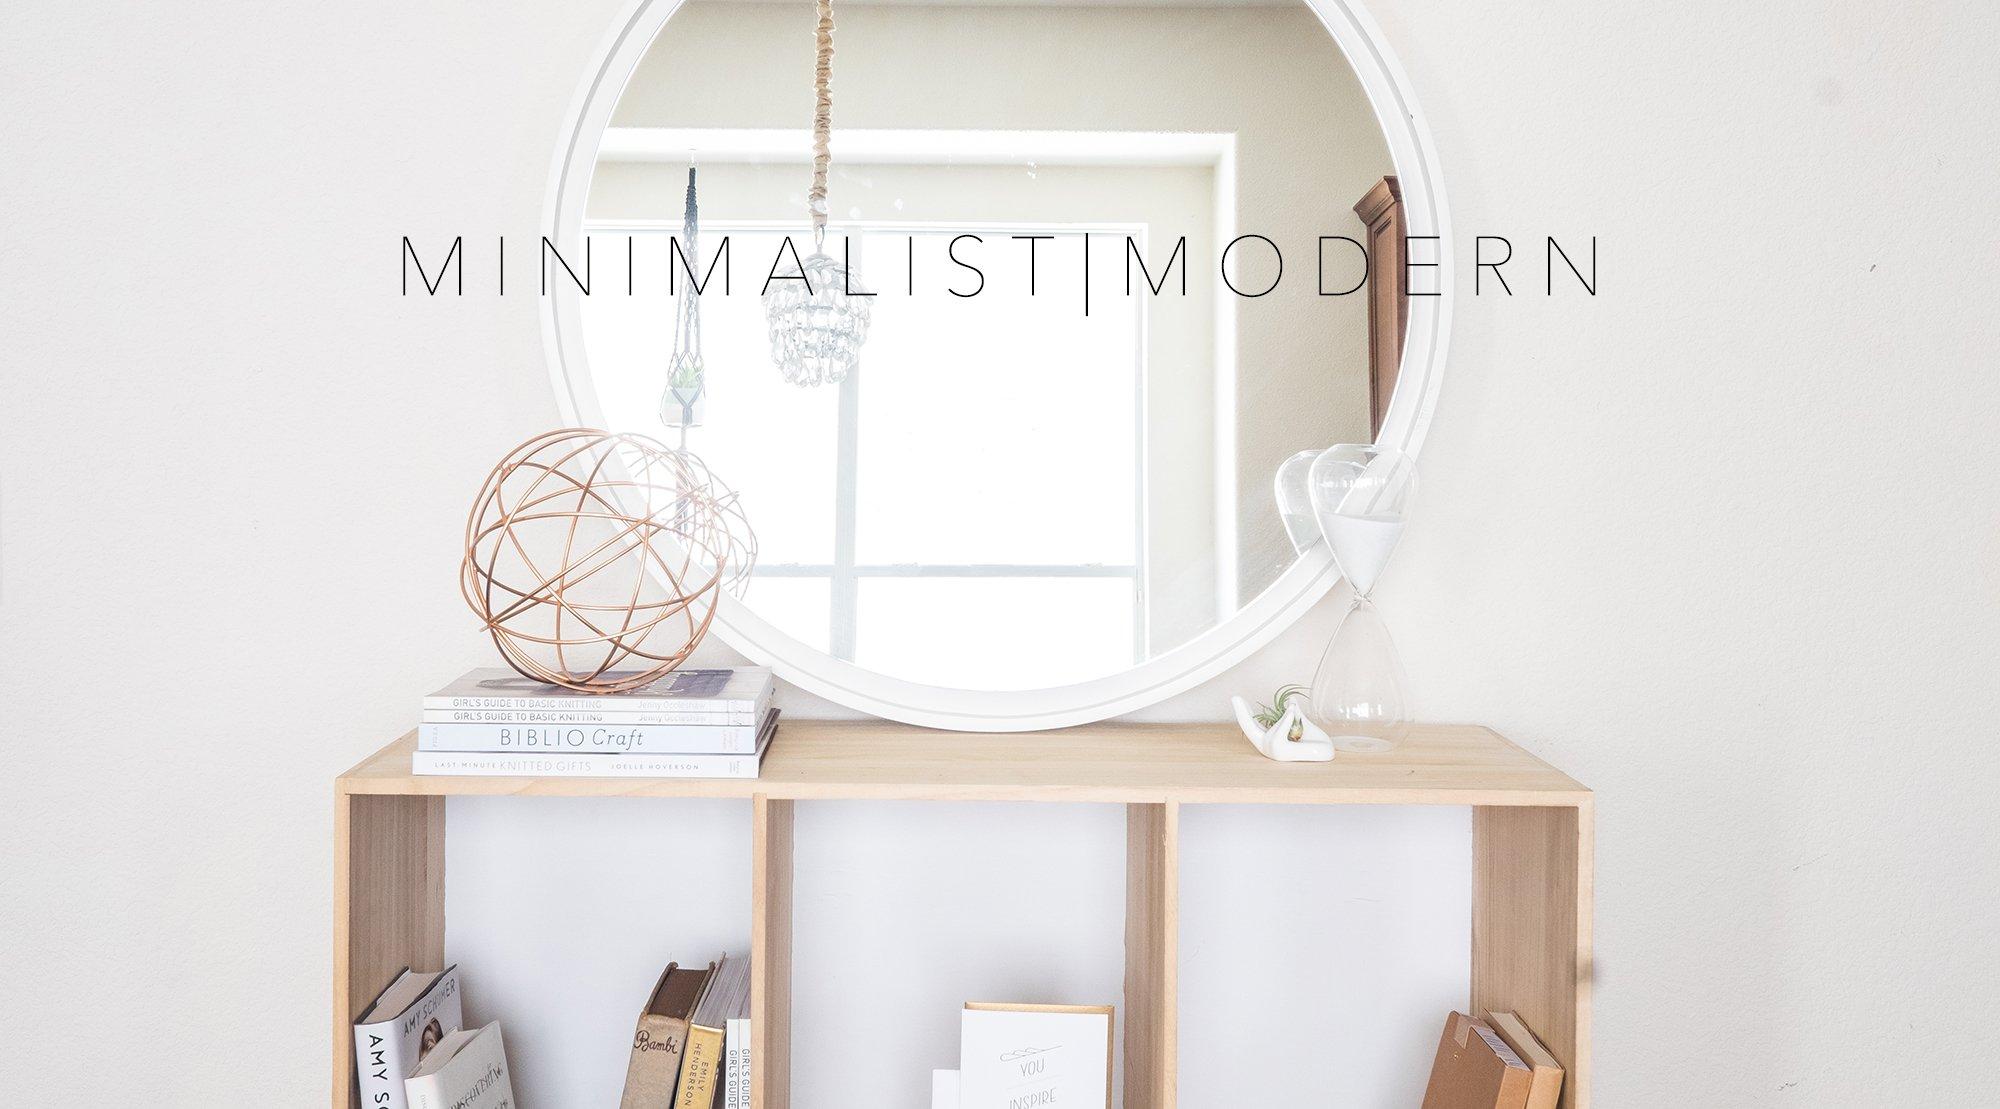 Love Ding Blog-Home Staging and Interiors-Minimalist-Styled-Bookshelf.jpg